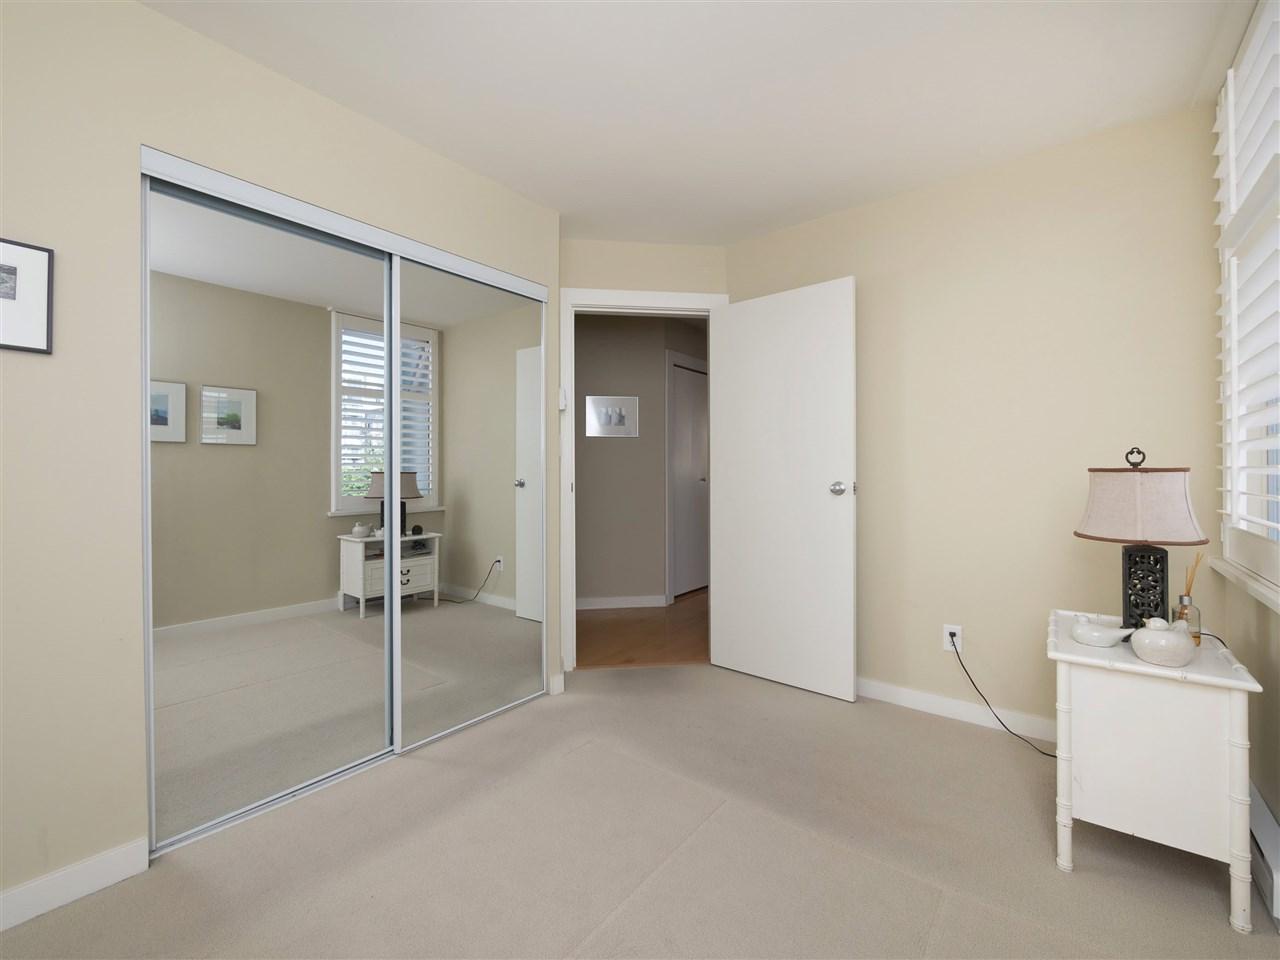 Condo Apartment at 303 1436 HARWOOD STREET, Unit 303, Vancouver West, British Columbia. Image 11